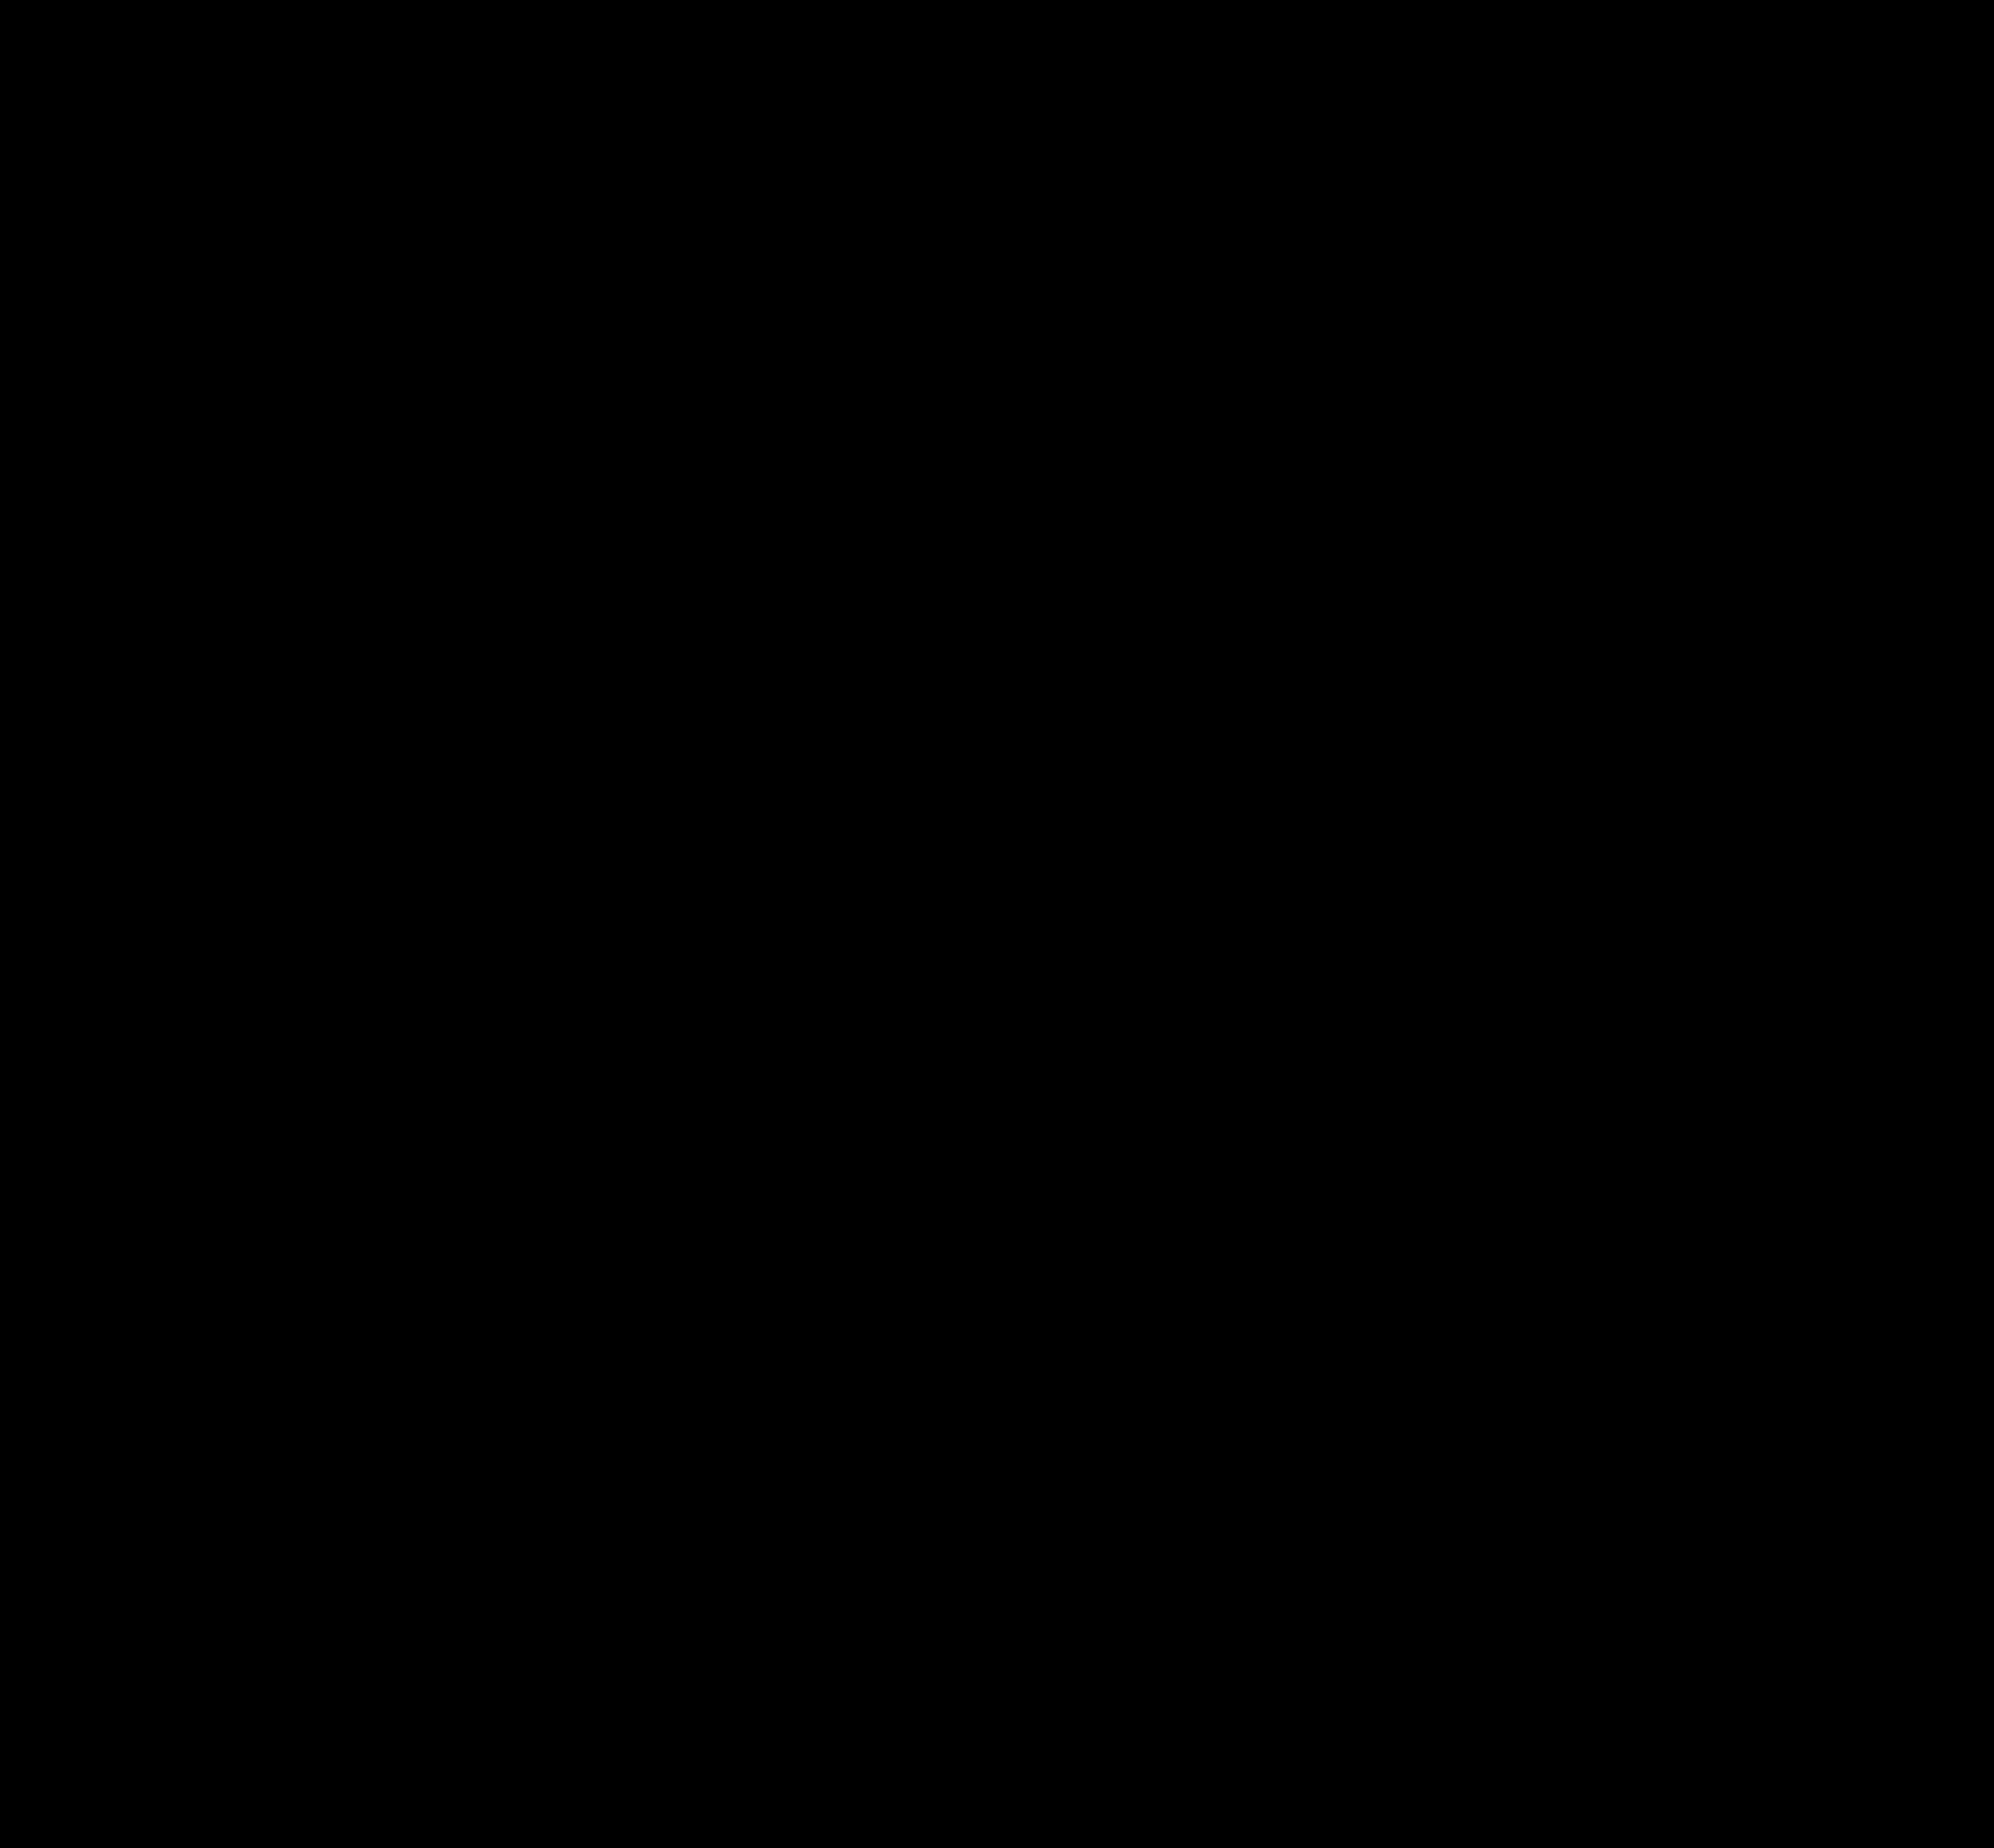 clipart-camera-icon-logo-circle-7